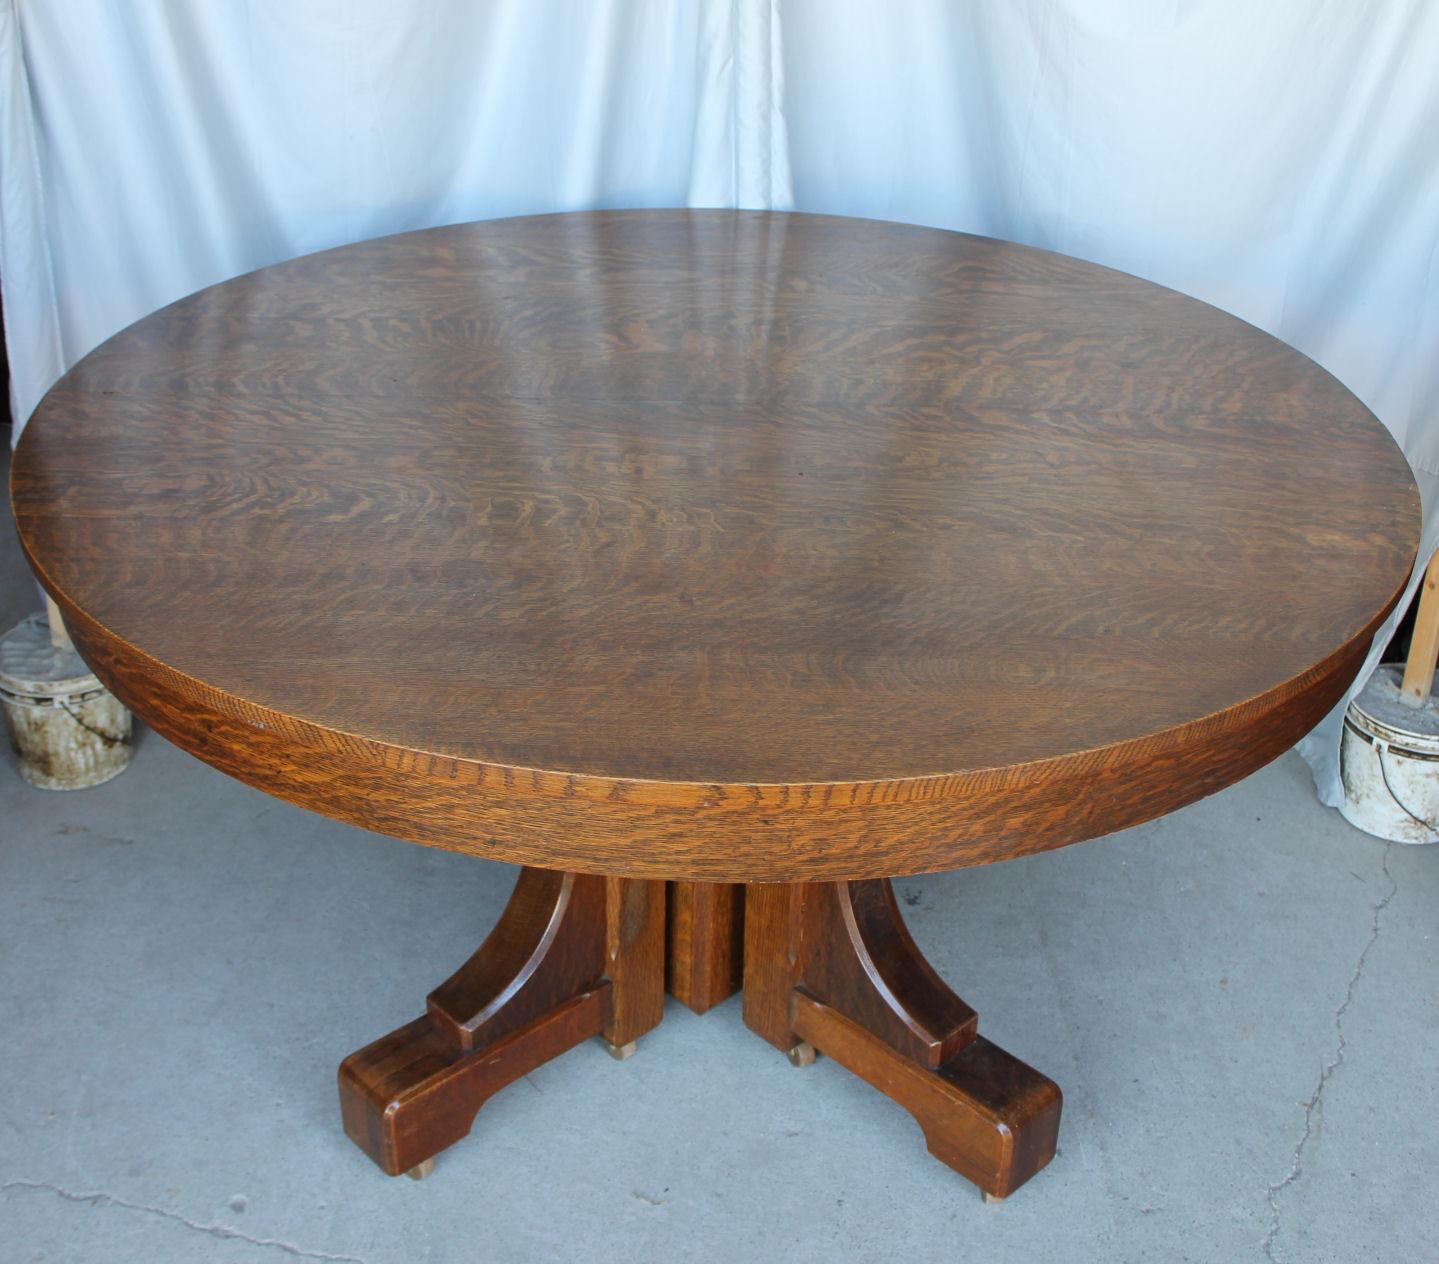 Bargain John S Antiques Mission Style Round Oak Dining